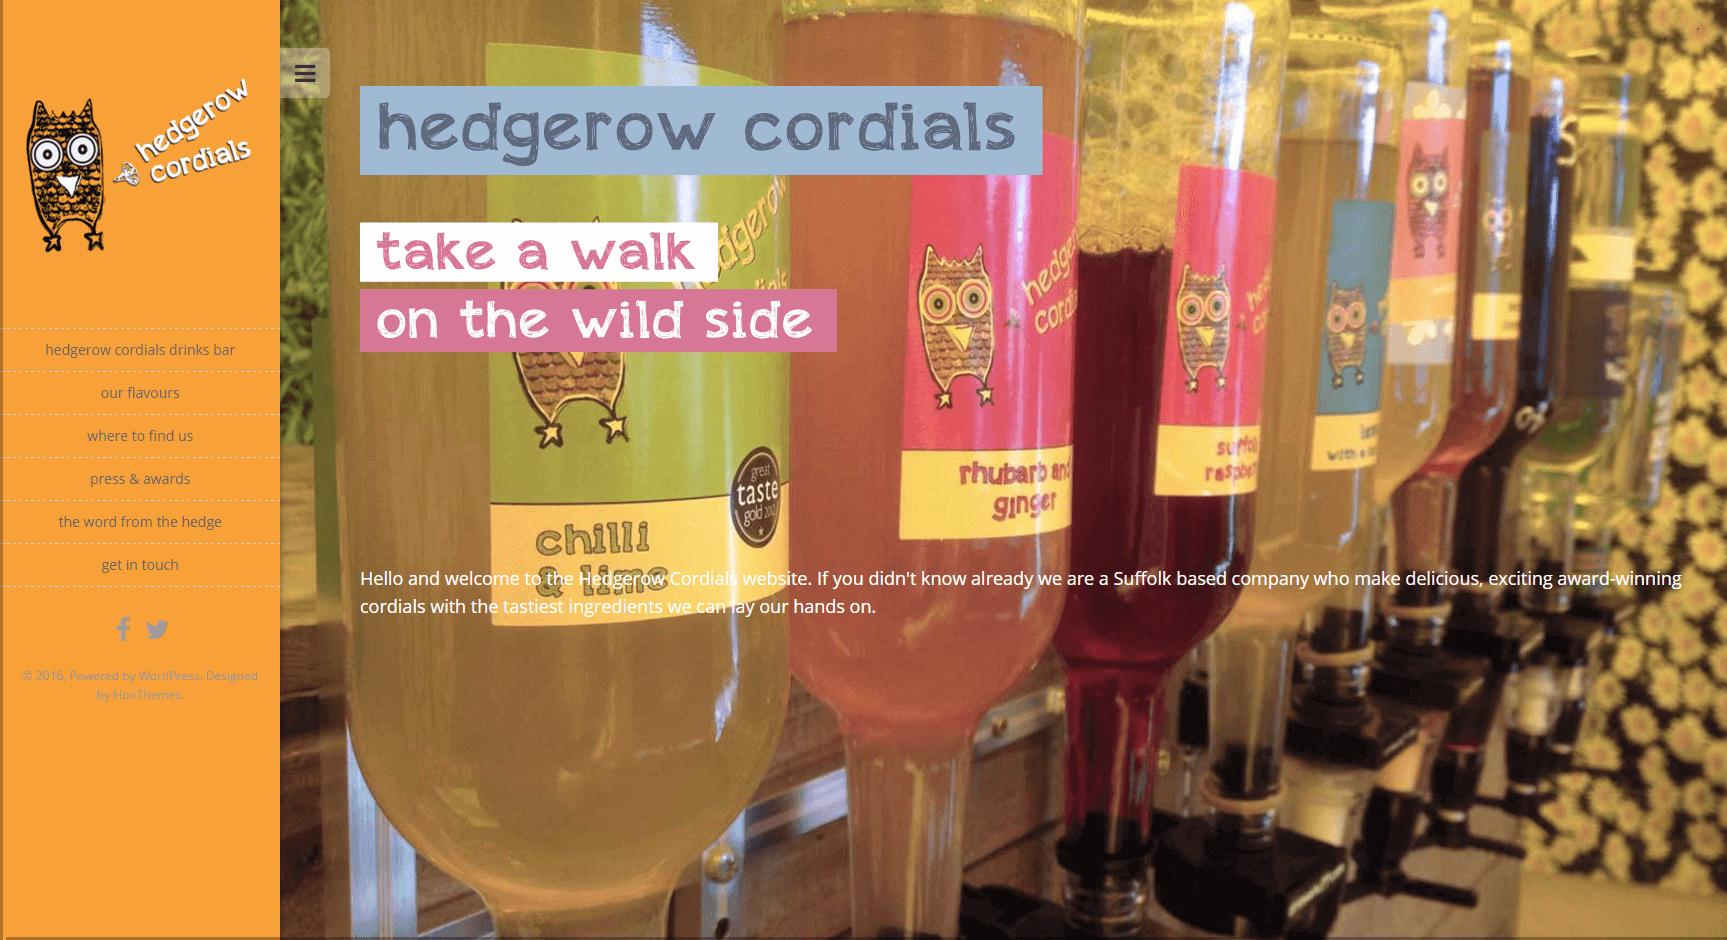 Hedgerow Cordials